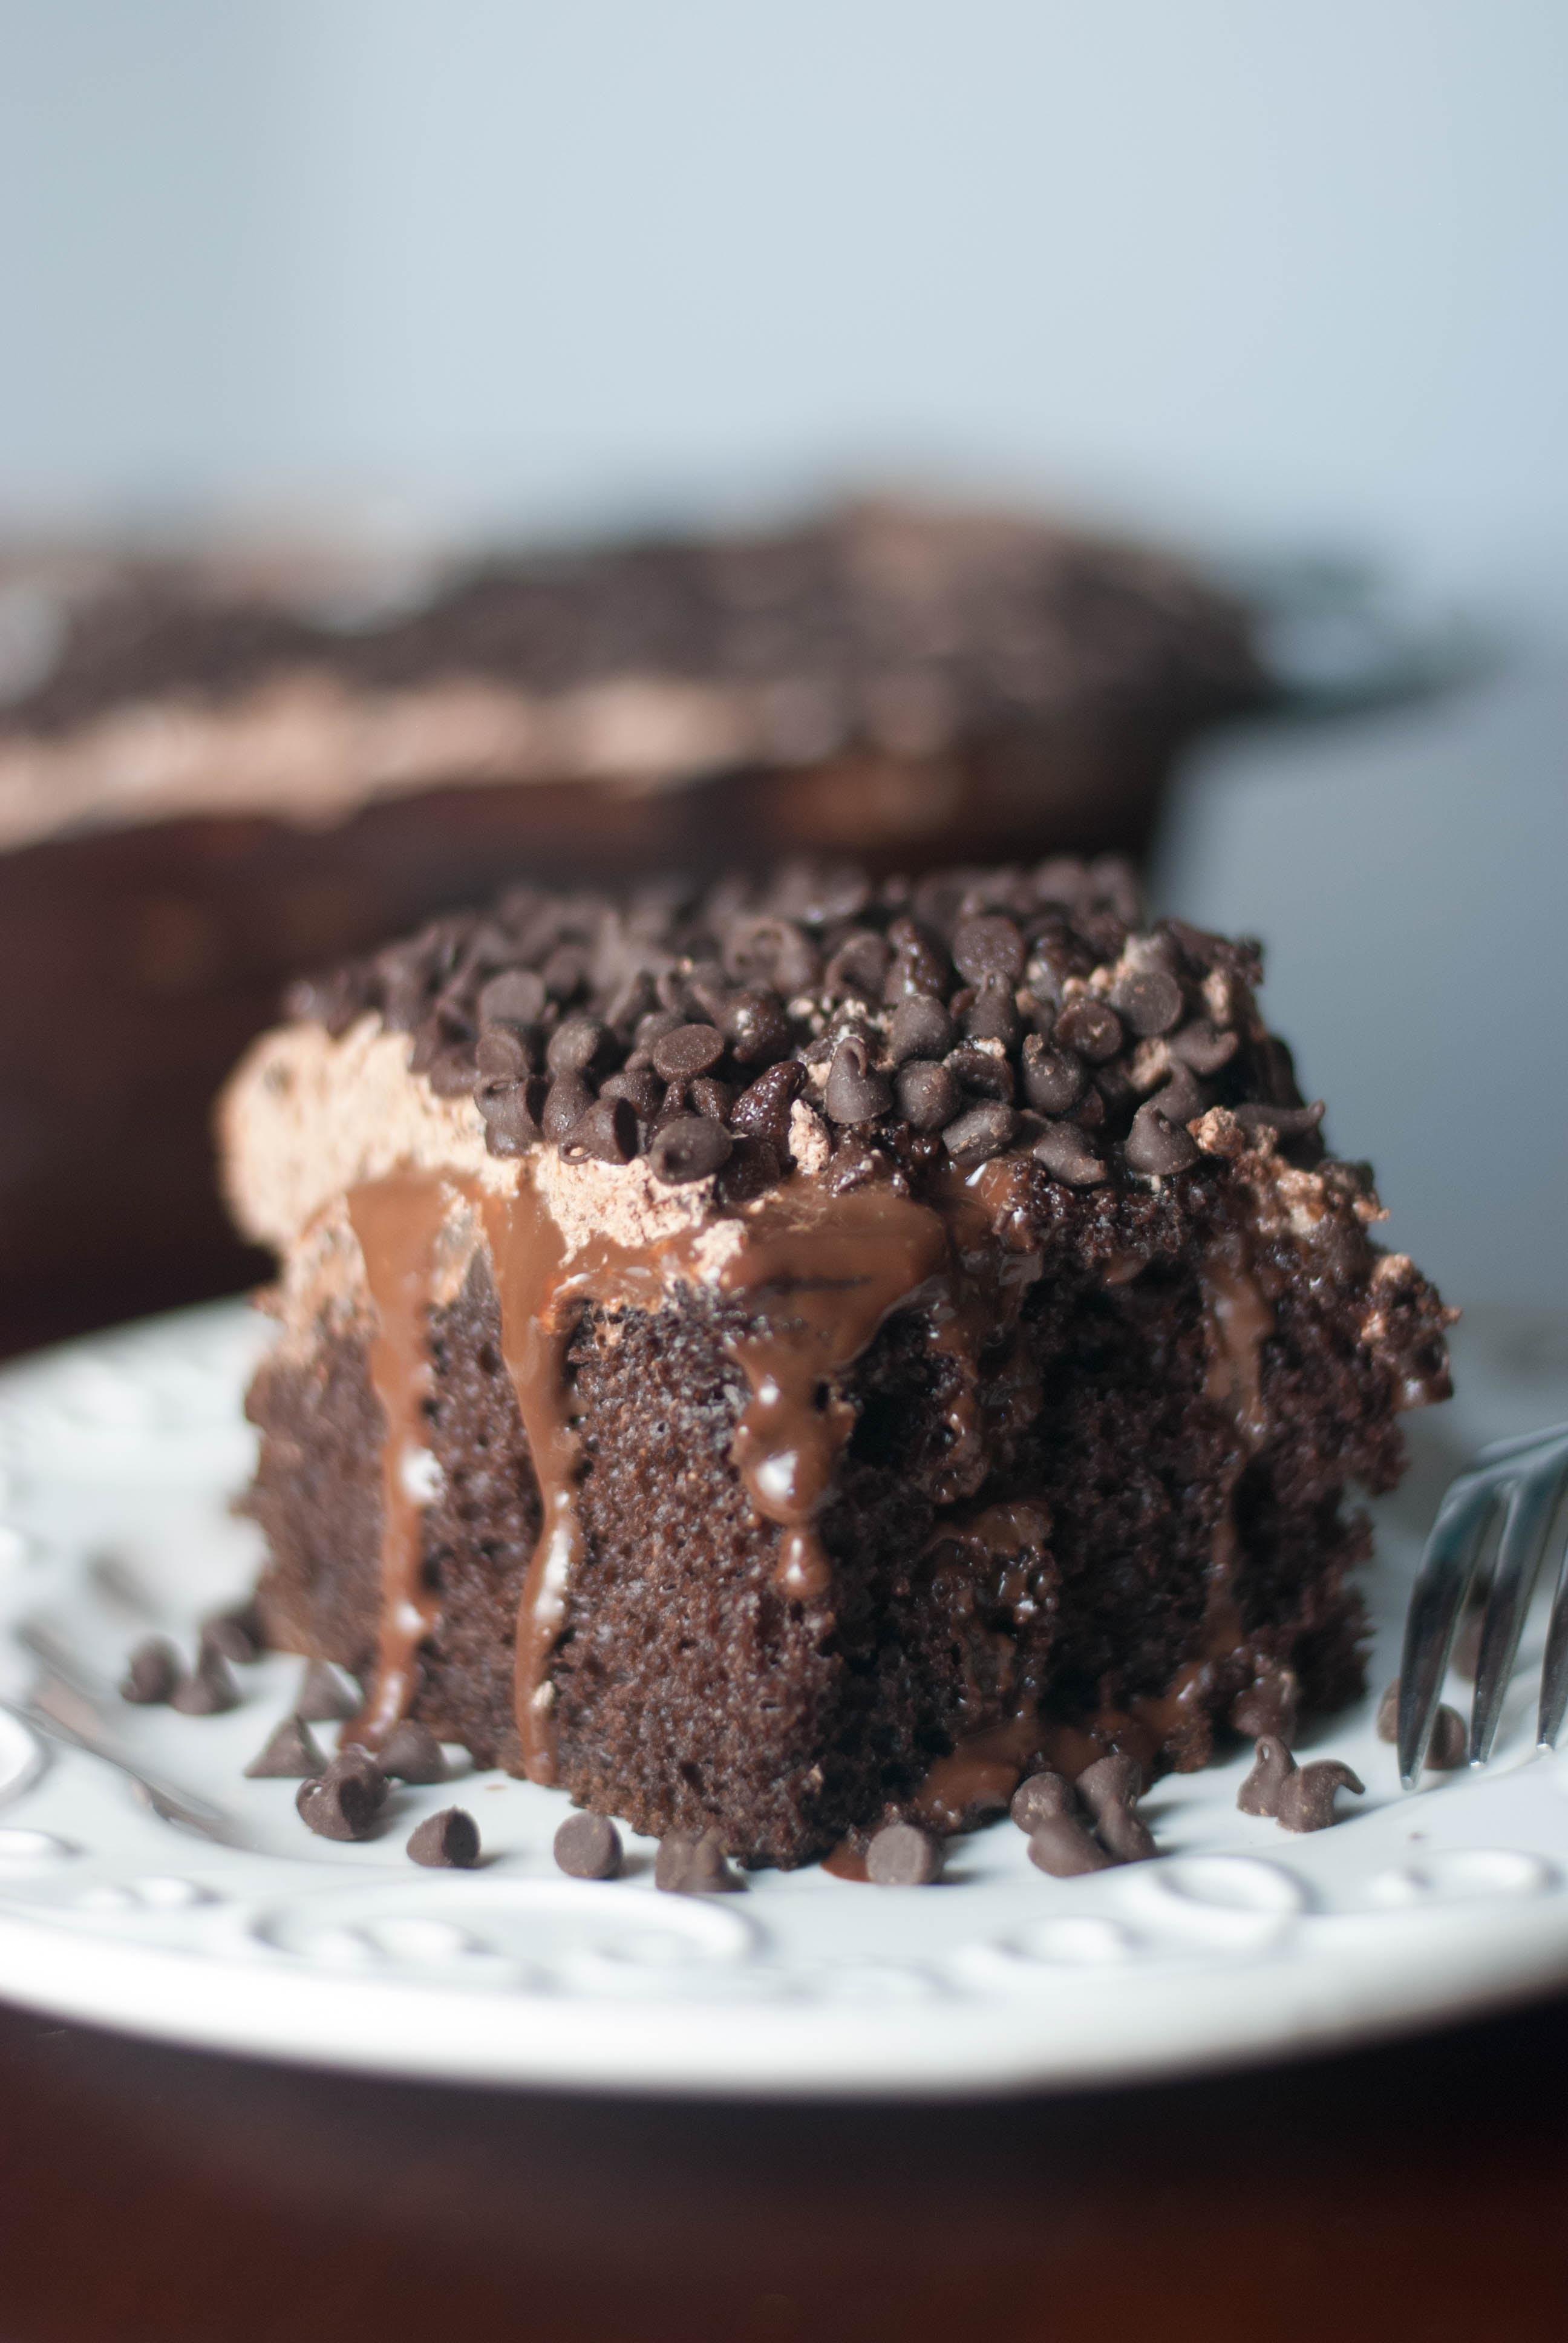 Chocolate Pudding Poke Cake - TGIF - This Grandma is Fun